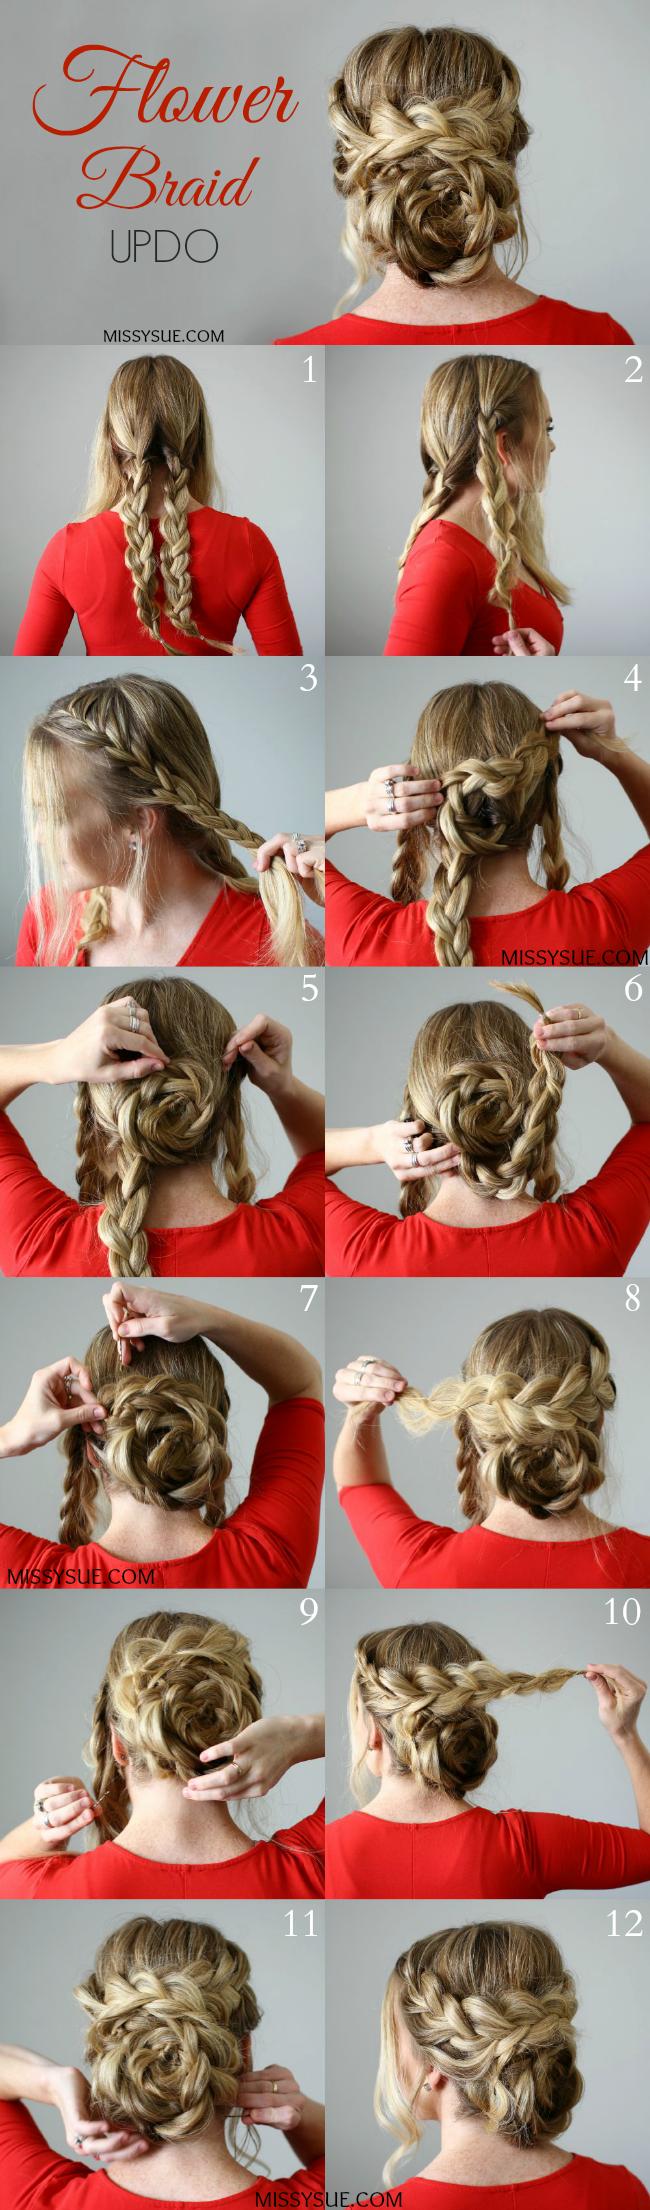 flower braid updo | hair inspiration | long hair styles